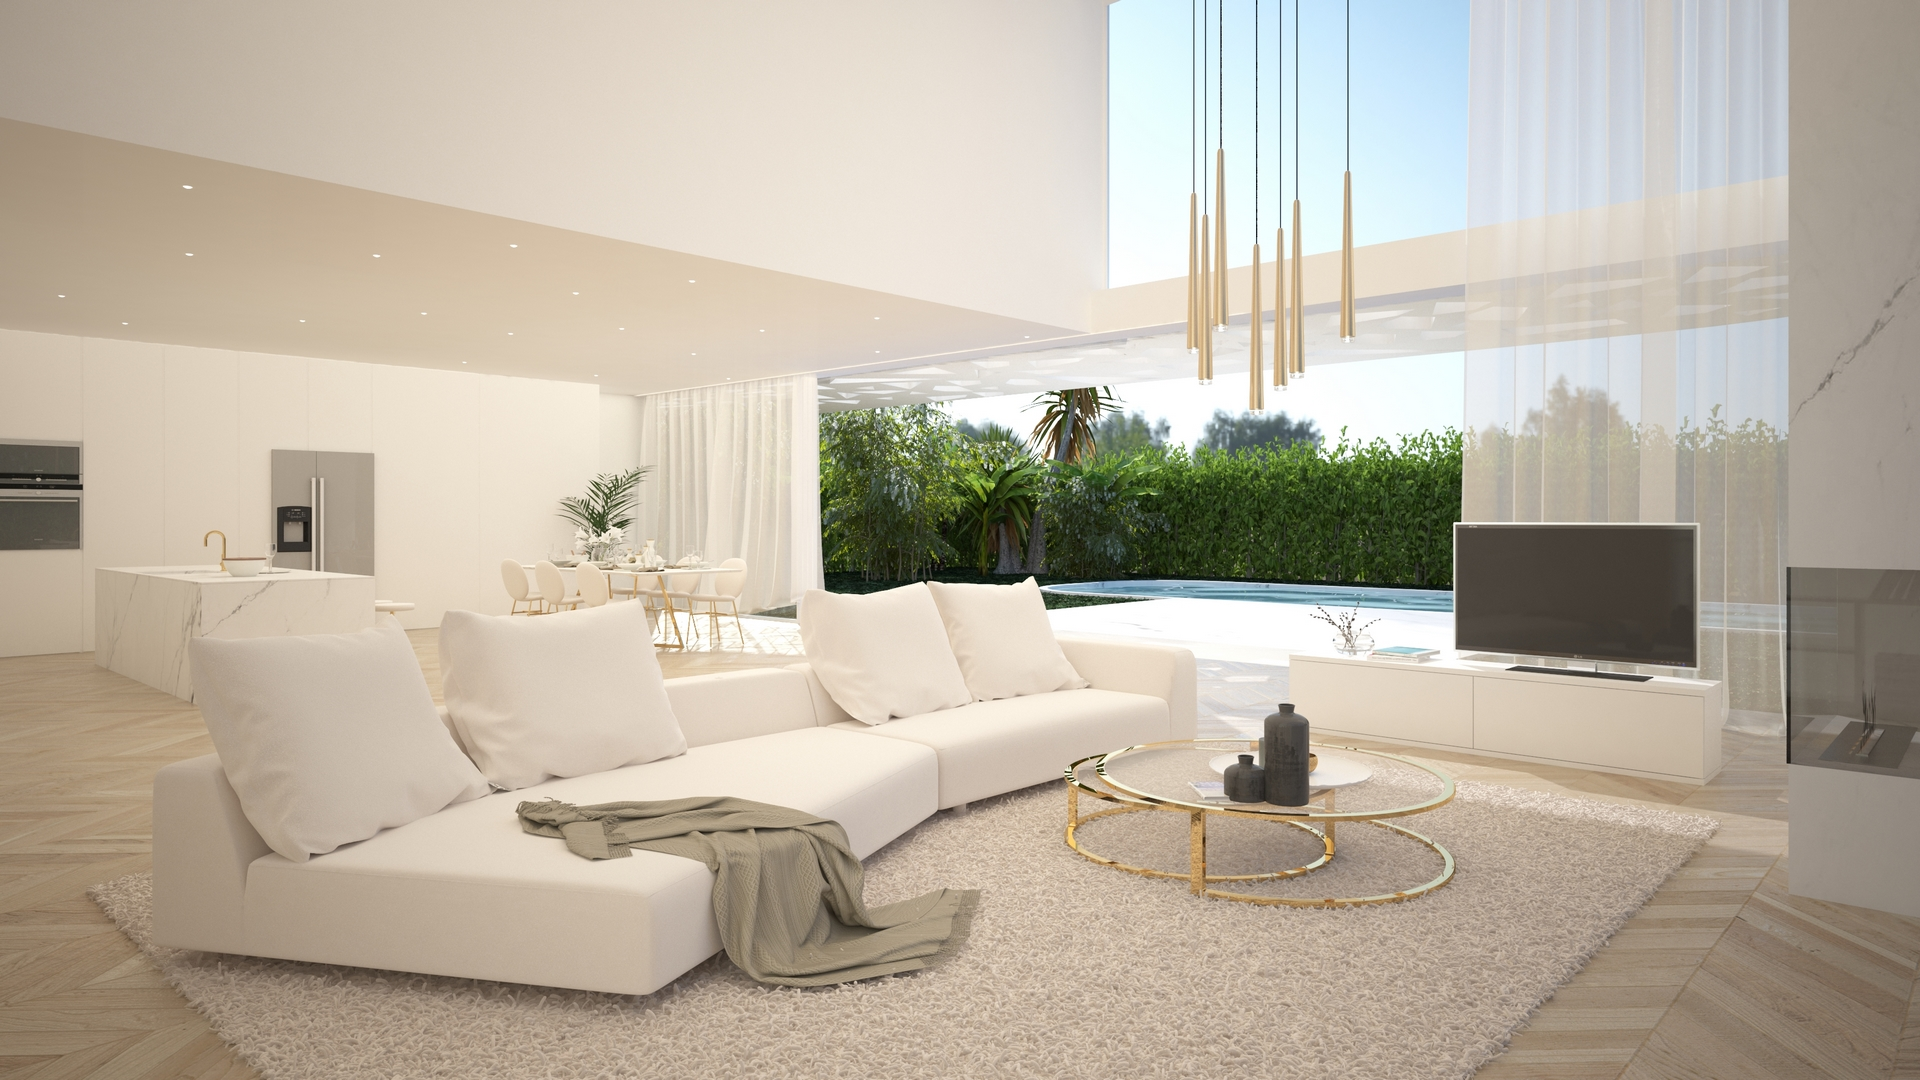 Ground floor - living room (Αντιγραφή)